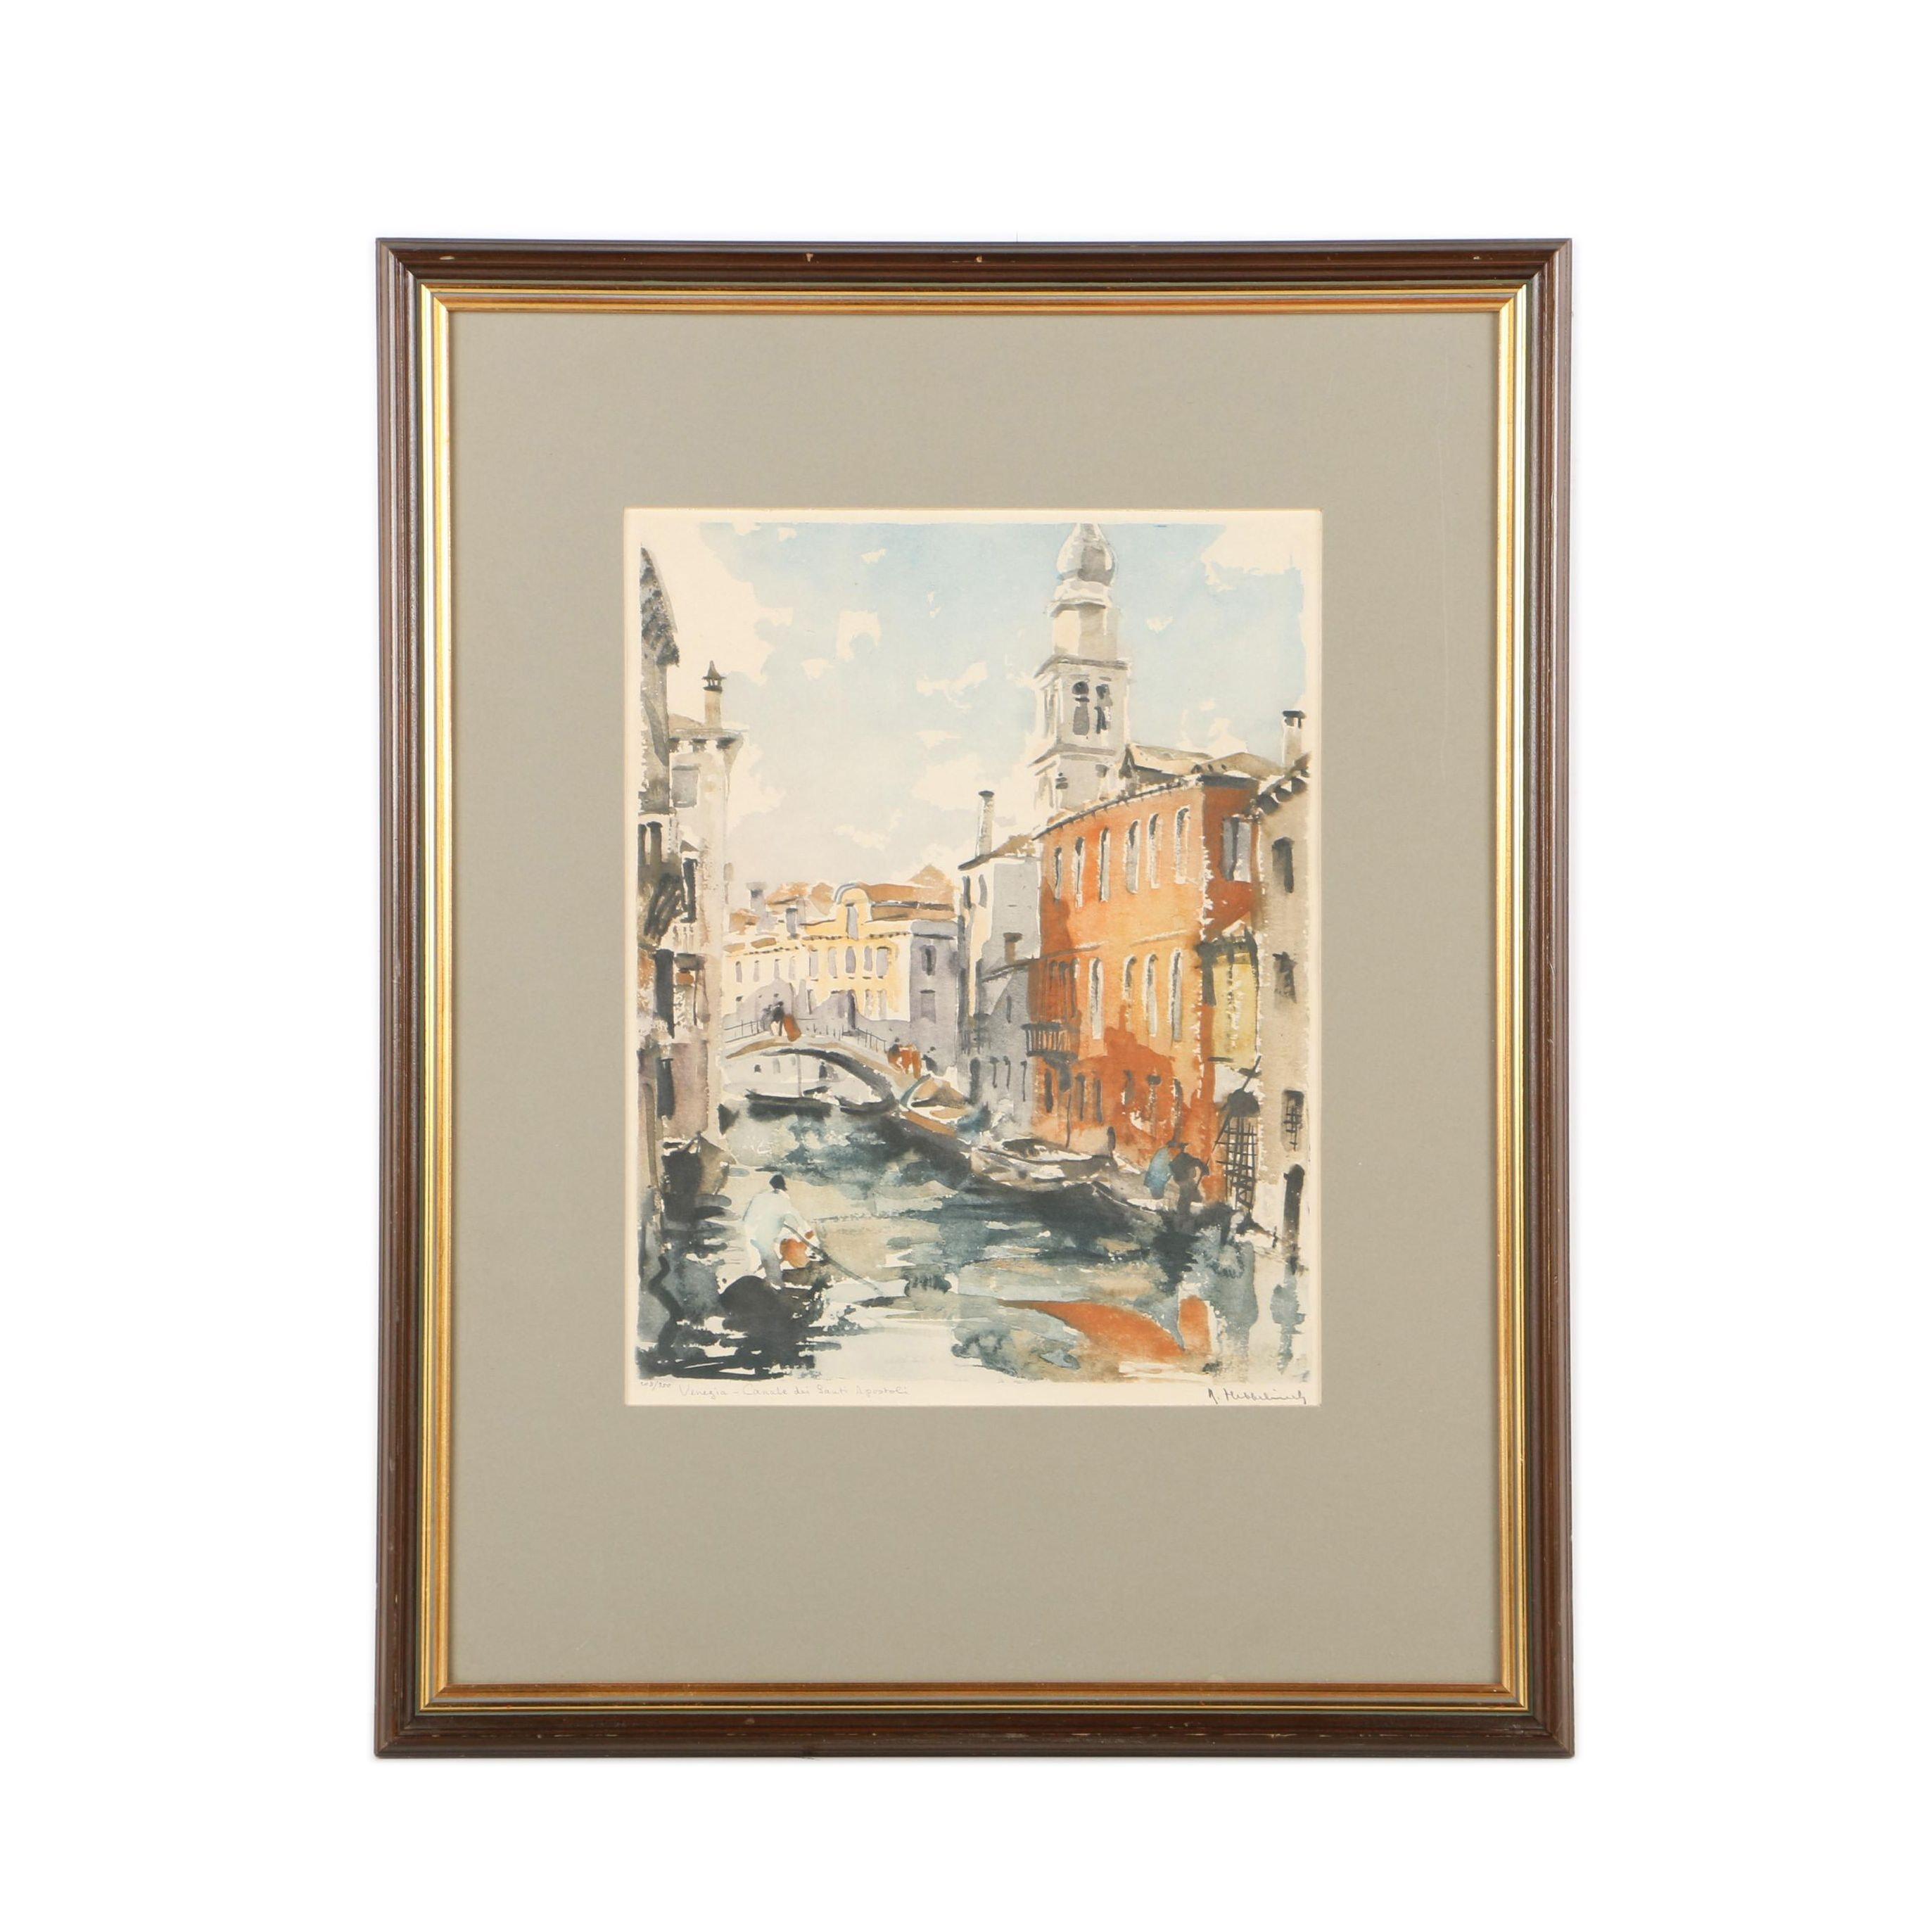 "Roger Hebbelinck Limited Edition Lithograph ""Venezia, Canale dei Santi Apostoli"""